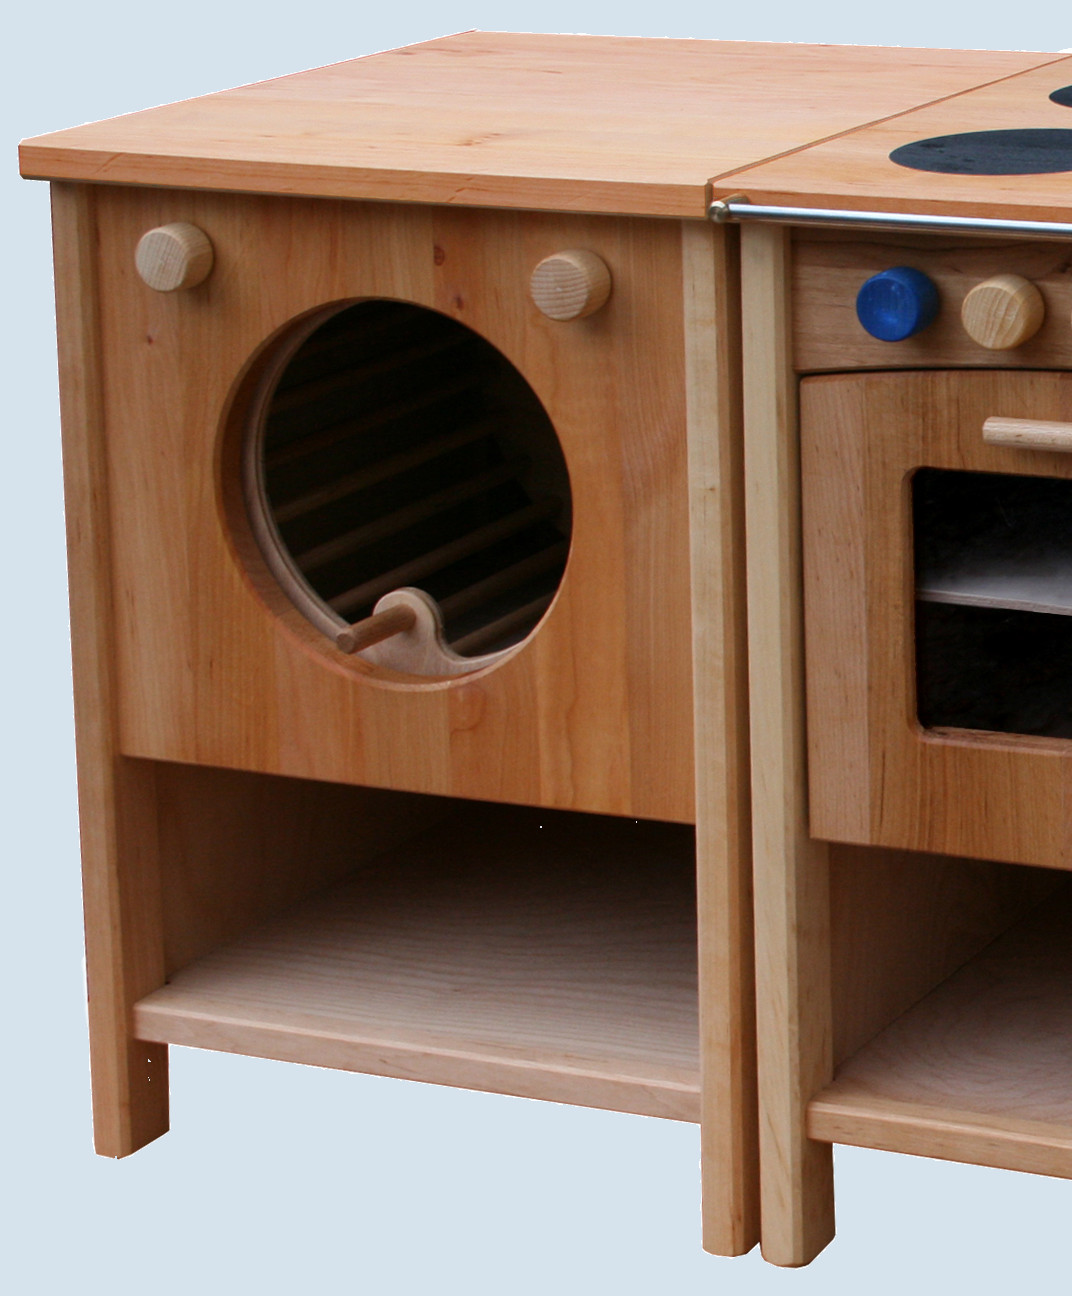 sch llner waschmaschine f r spielk che singl erlenholz. Black Bedroom Furniture Sets. Home Design Ideas